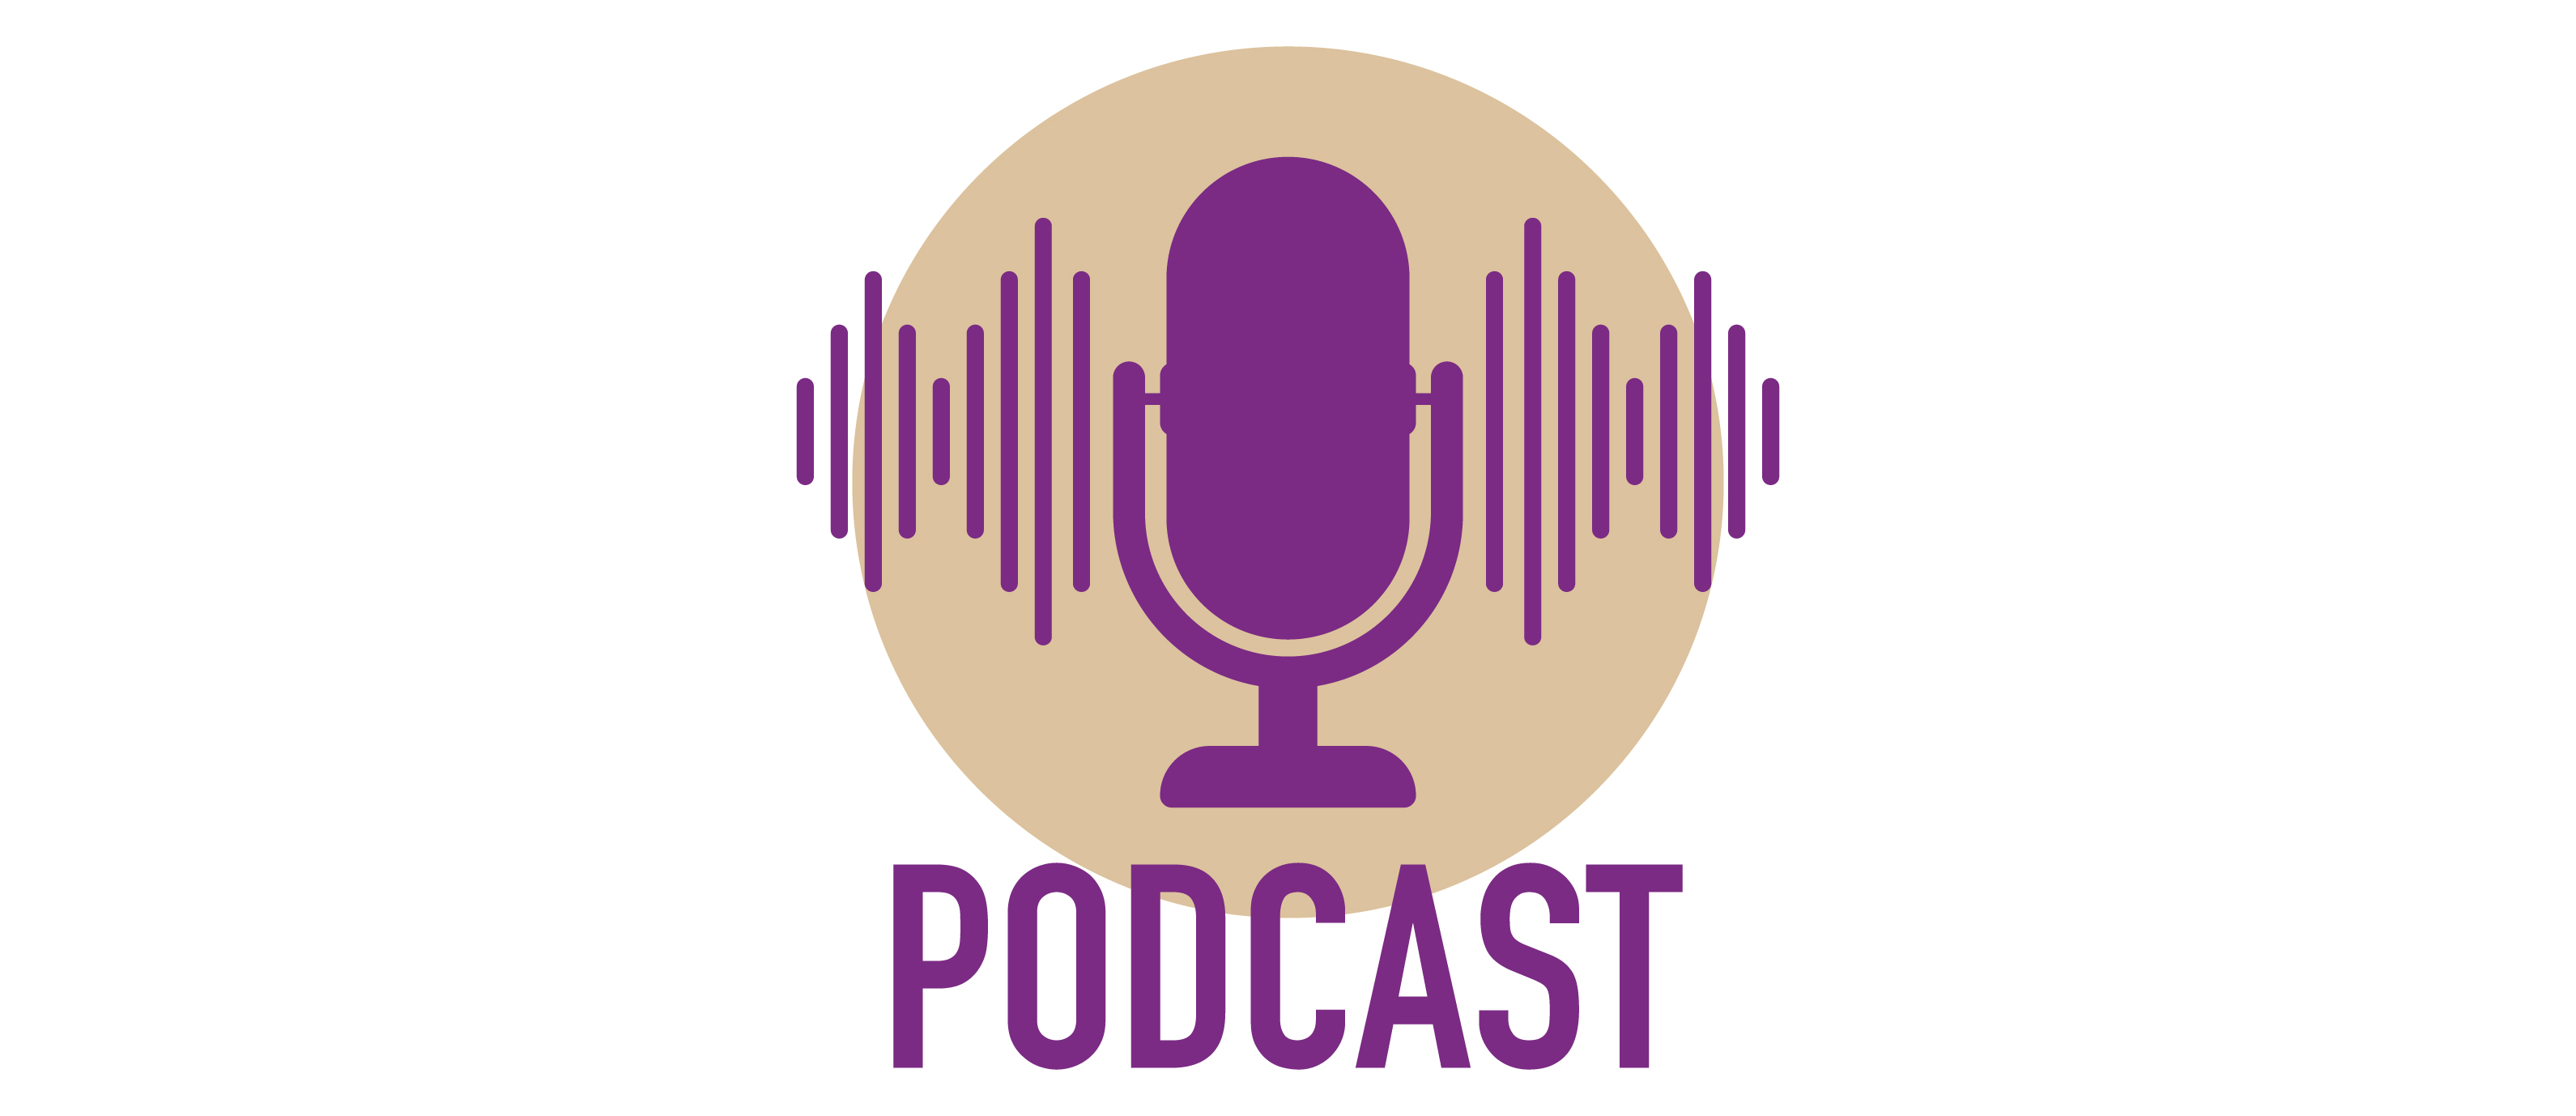 iStock-1192908503 podcast legal drew